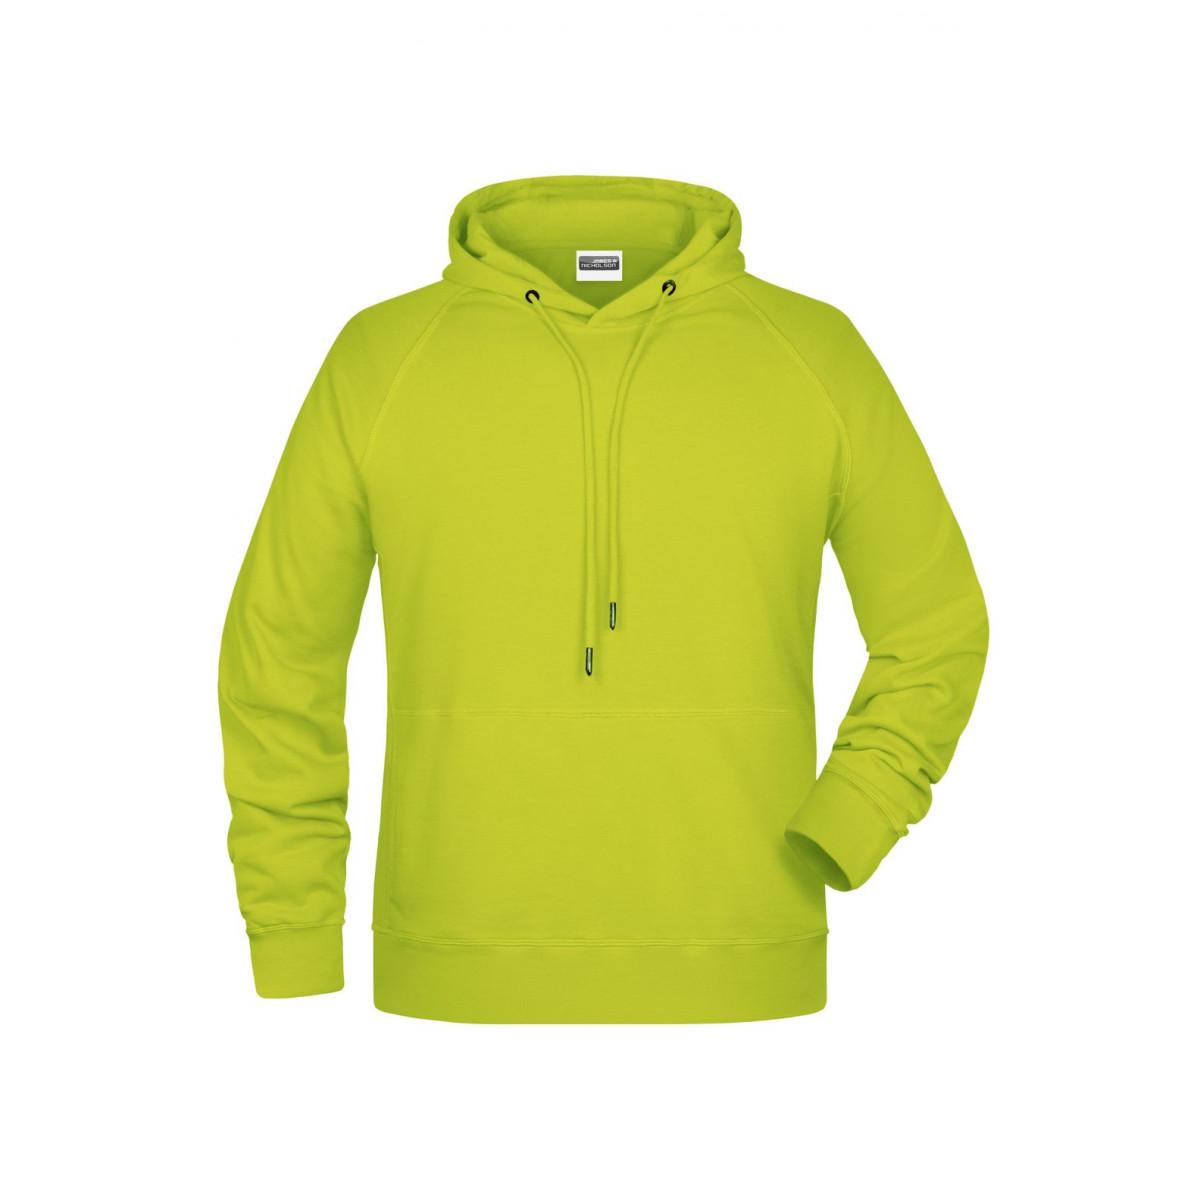 Толстовка мужская 8024 Mens Hoody - Ярко-желтый